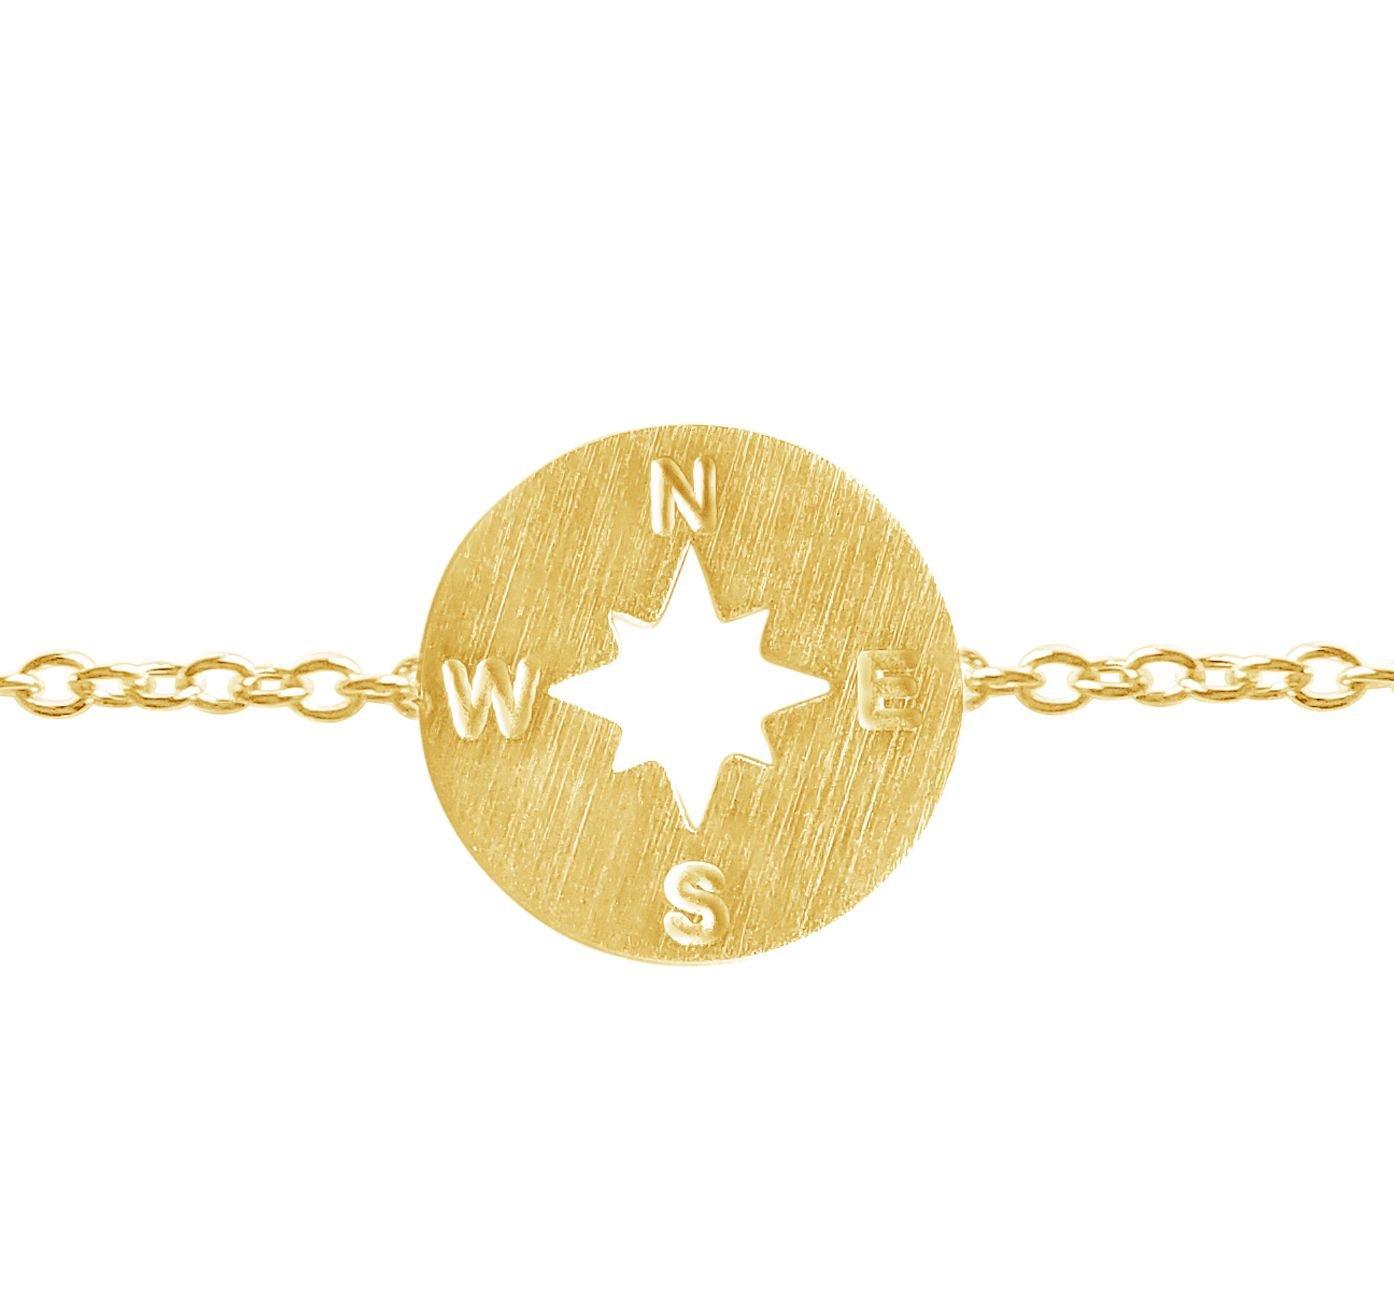 Rosa Vila Compass Bracelet - Direction of Life & I'd Be Lost Without You, Woman's Friendship Bracelets for Bridesmaids or Best Friends (Gold Tone)